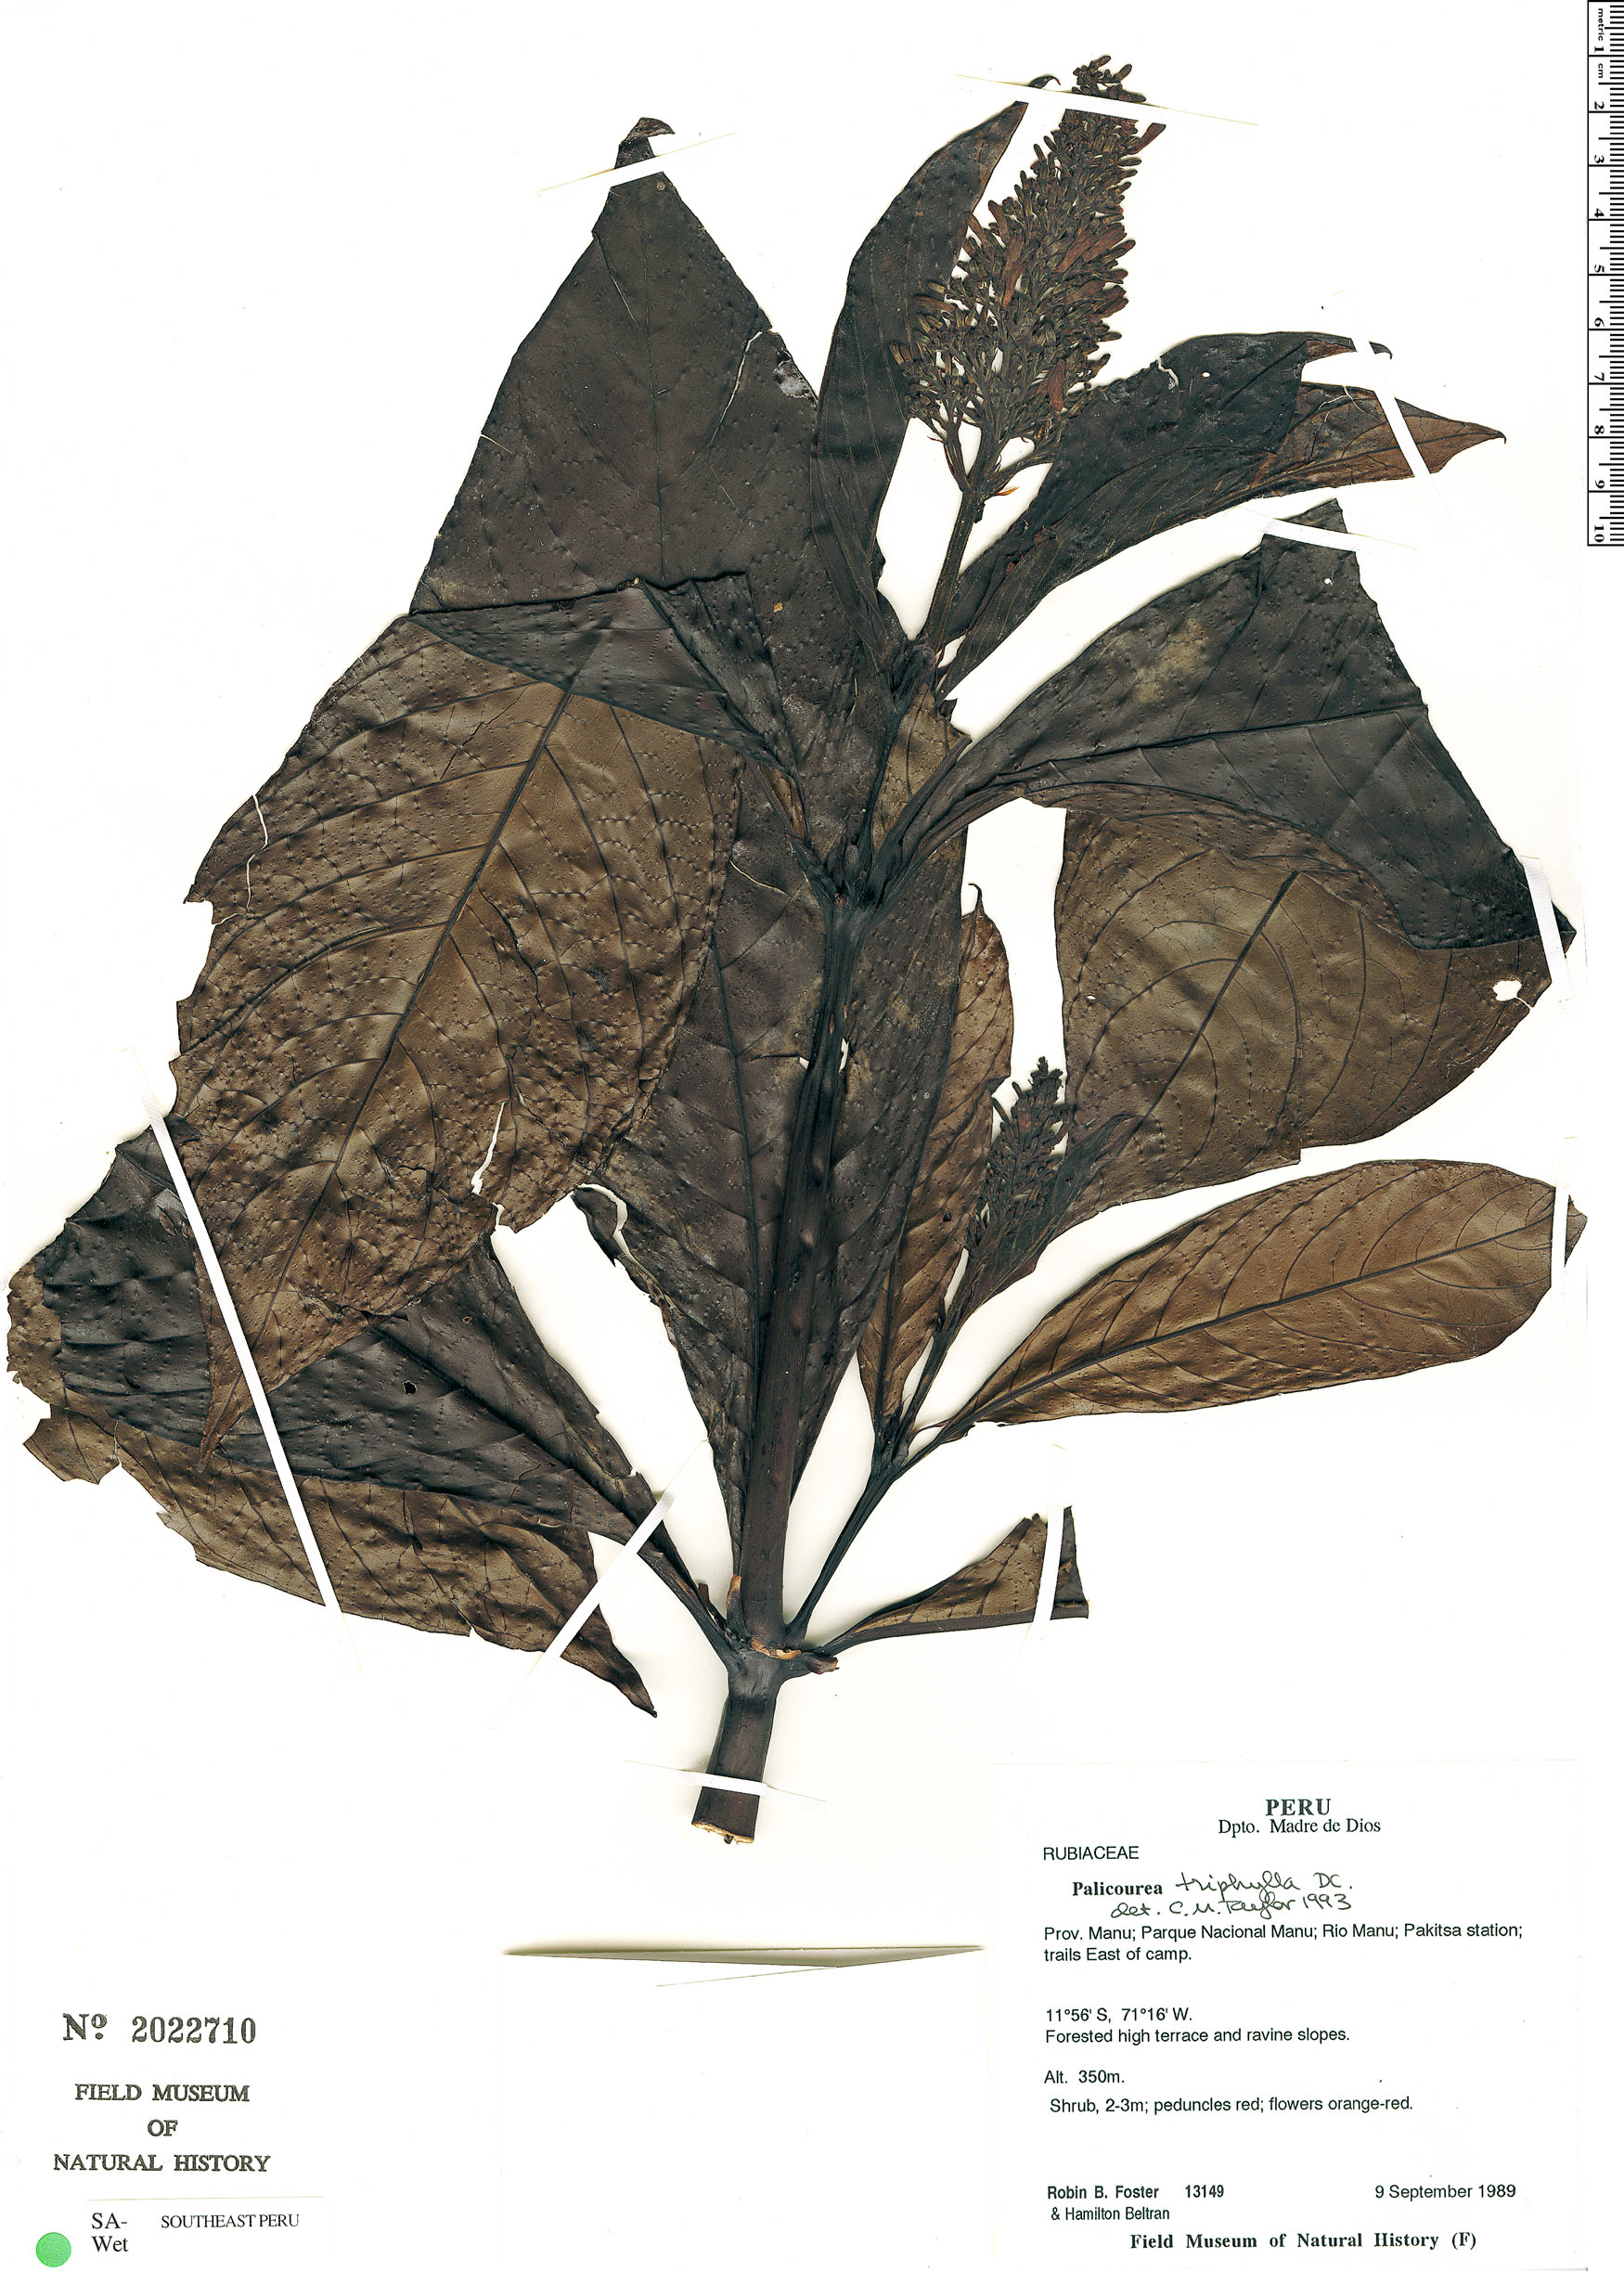 Specimen: Palicourea triphylla